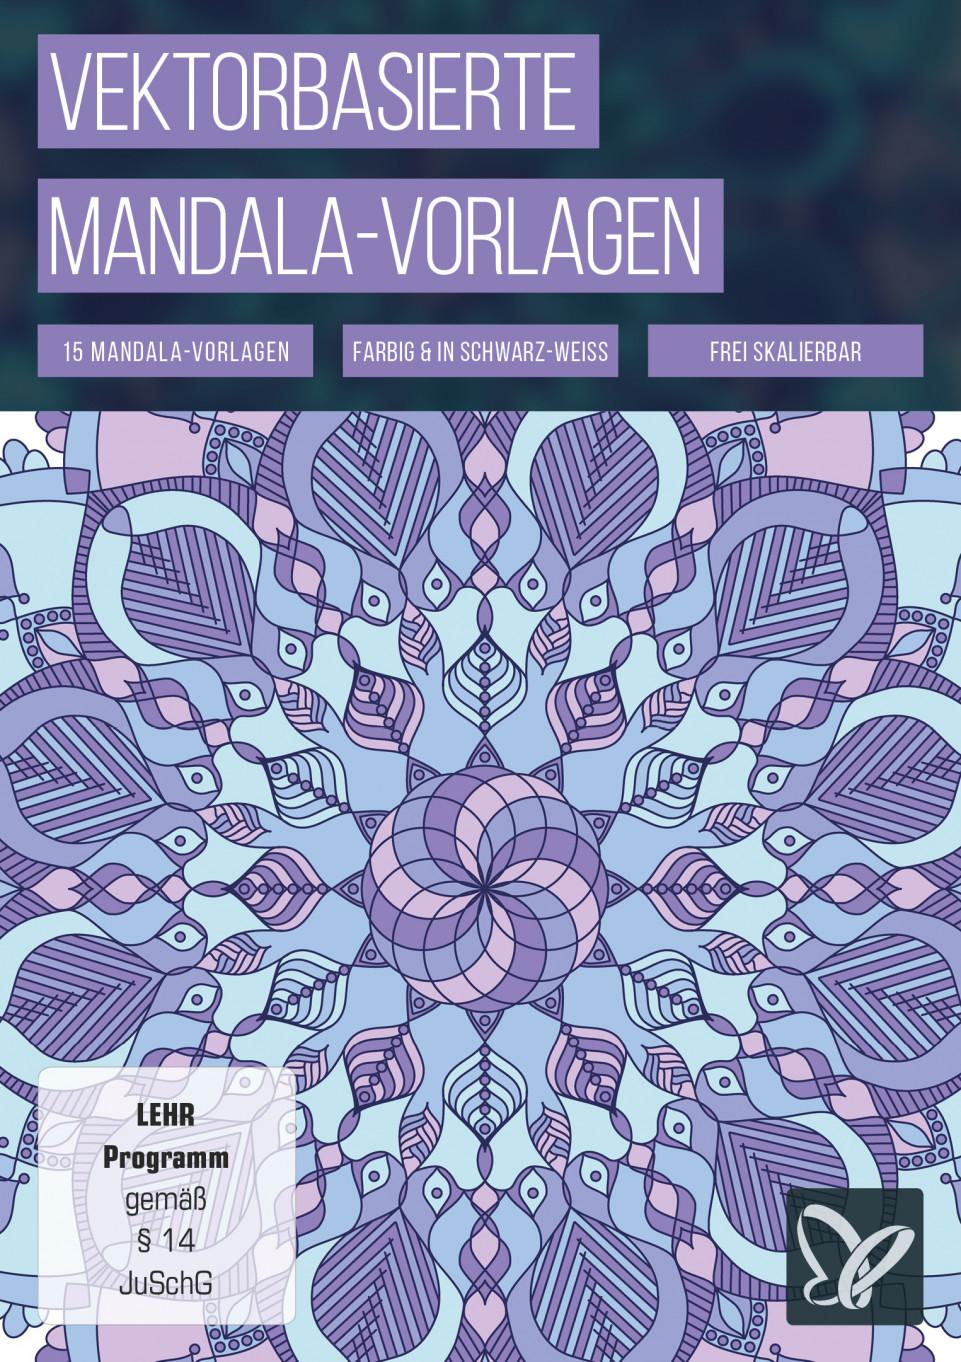 Faszinierende Formen: vektorbasierte Mandala-Vorlagen